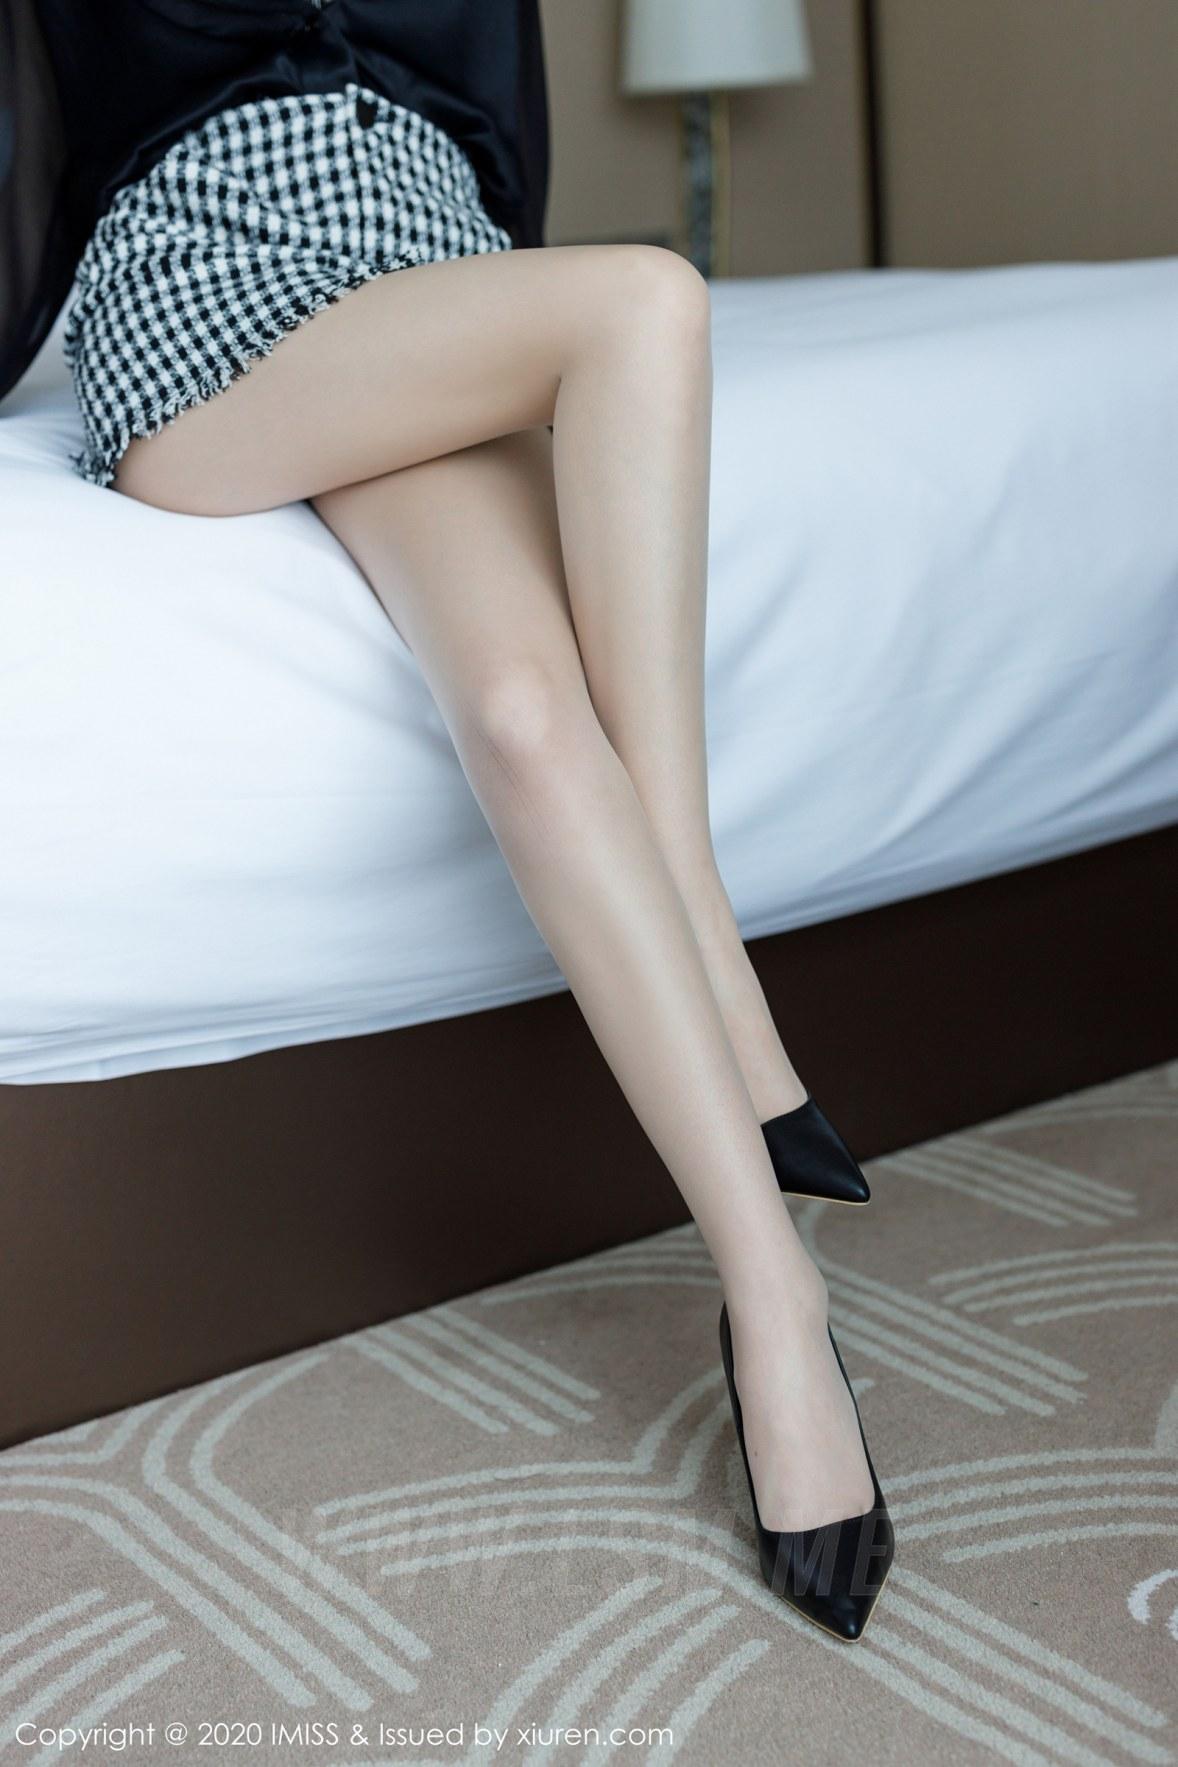 454 013 ln5 3600 5400 - IMiss 爱蜜社 Vol.454 丝袜美腿写真 九月生__ - 爱蜜社 -【免费在线写真】【丽人丝语】